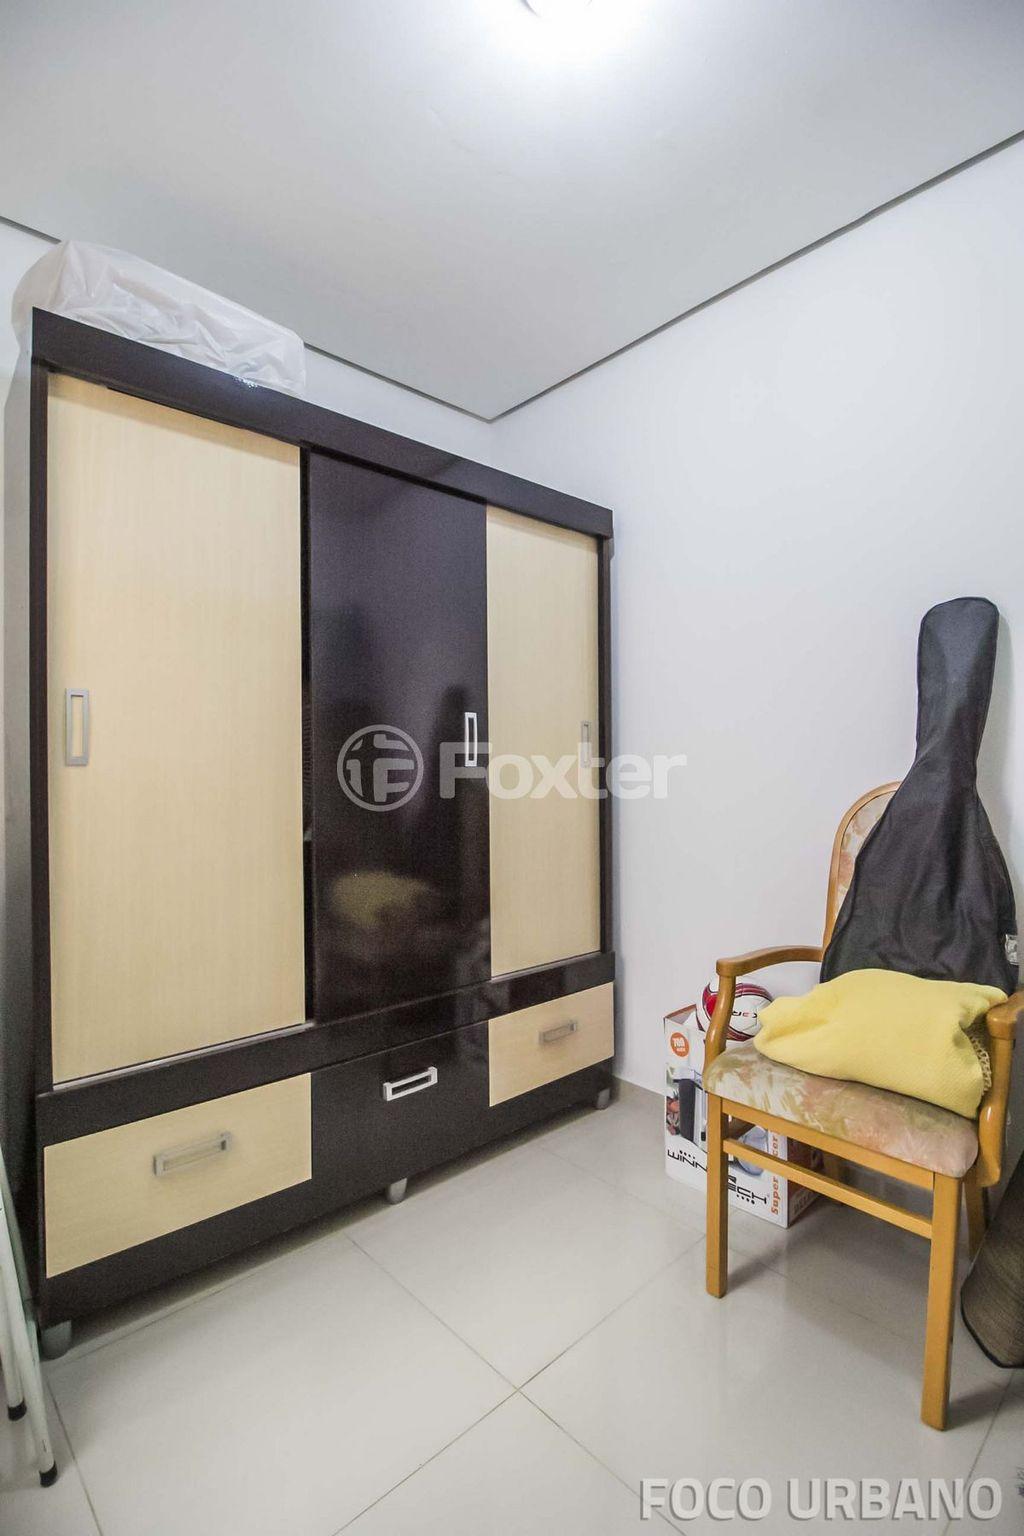 Cobertura 3 Dorm, Praia de Belas, Porto Alegre (141181) - Foto 28